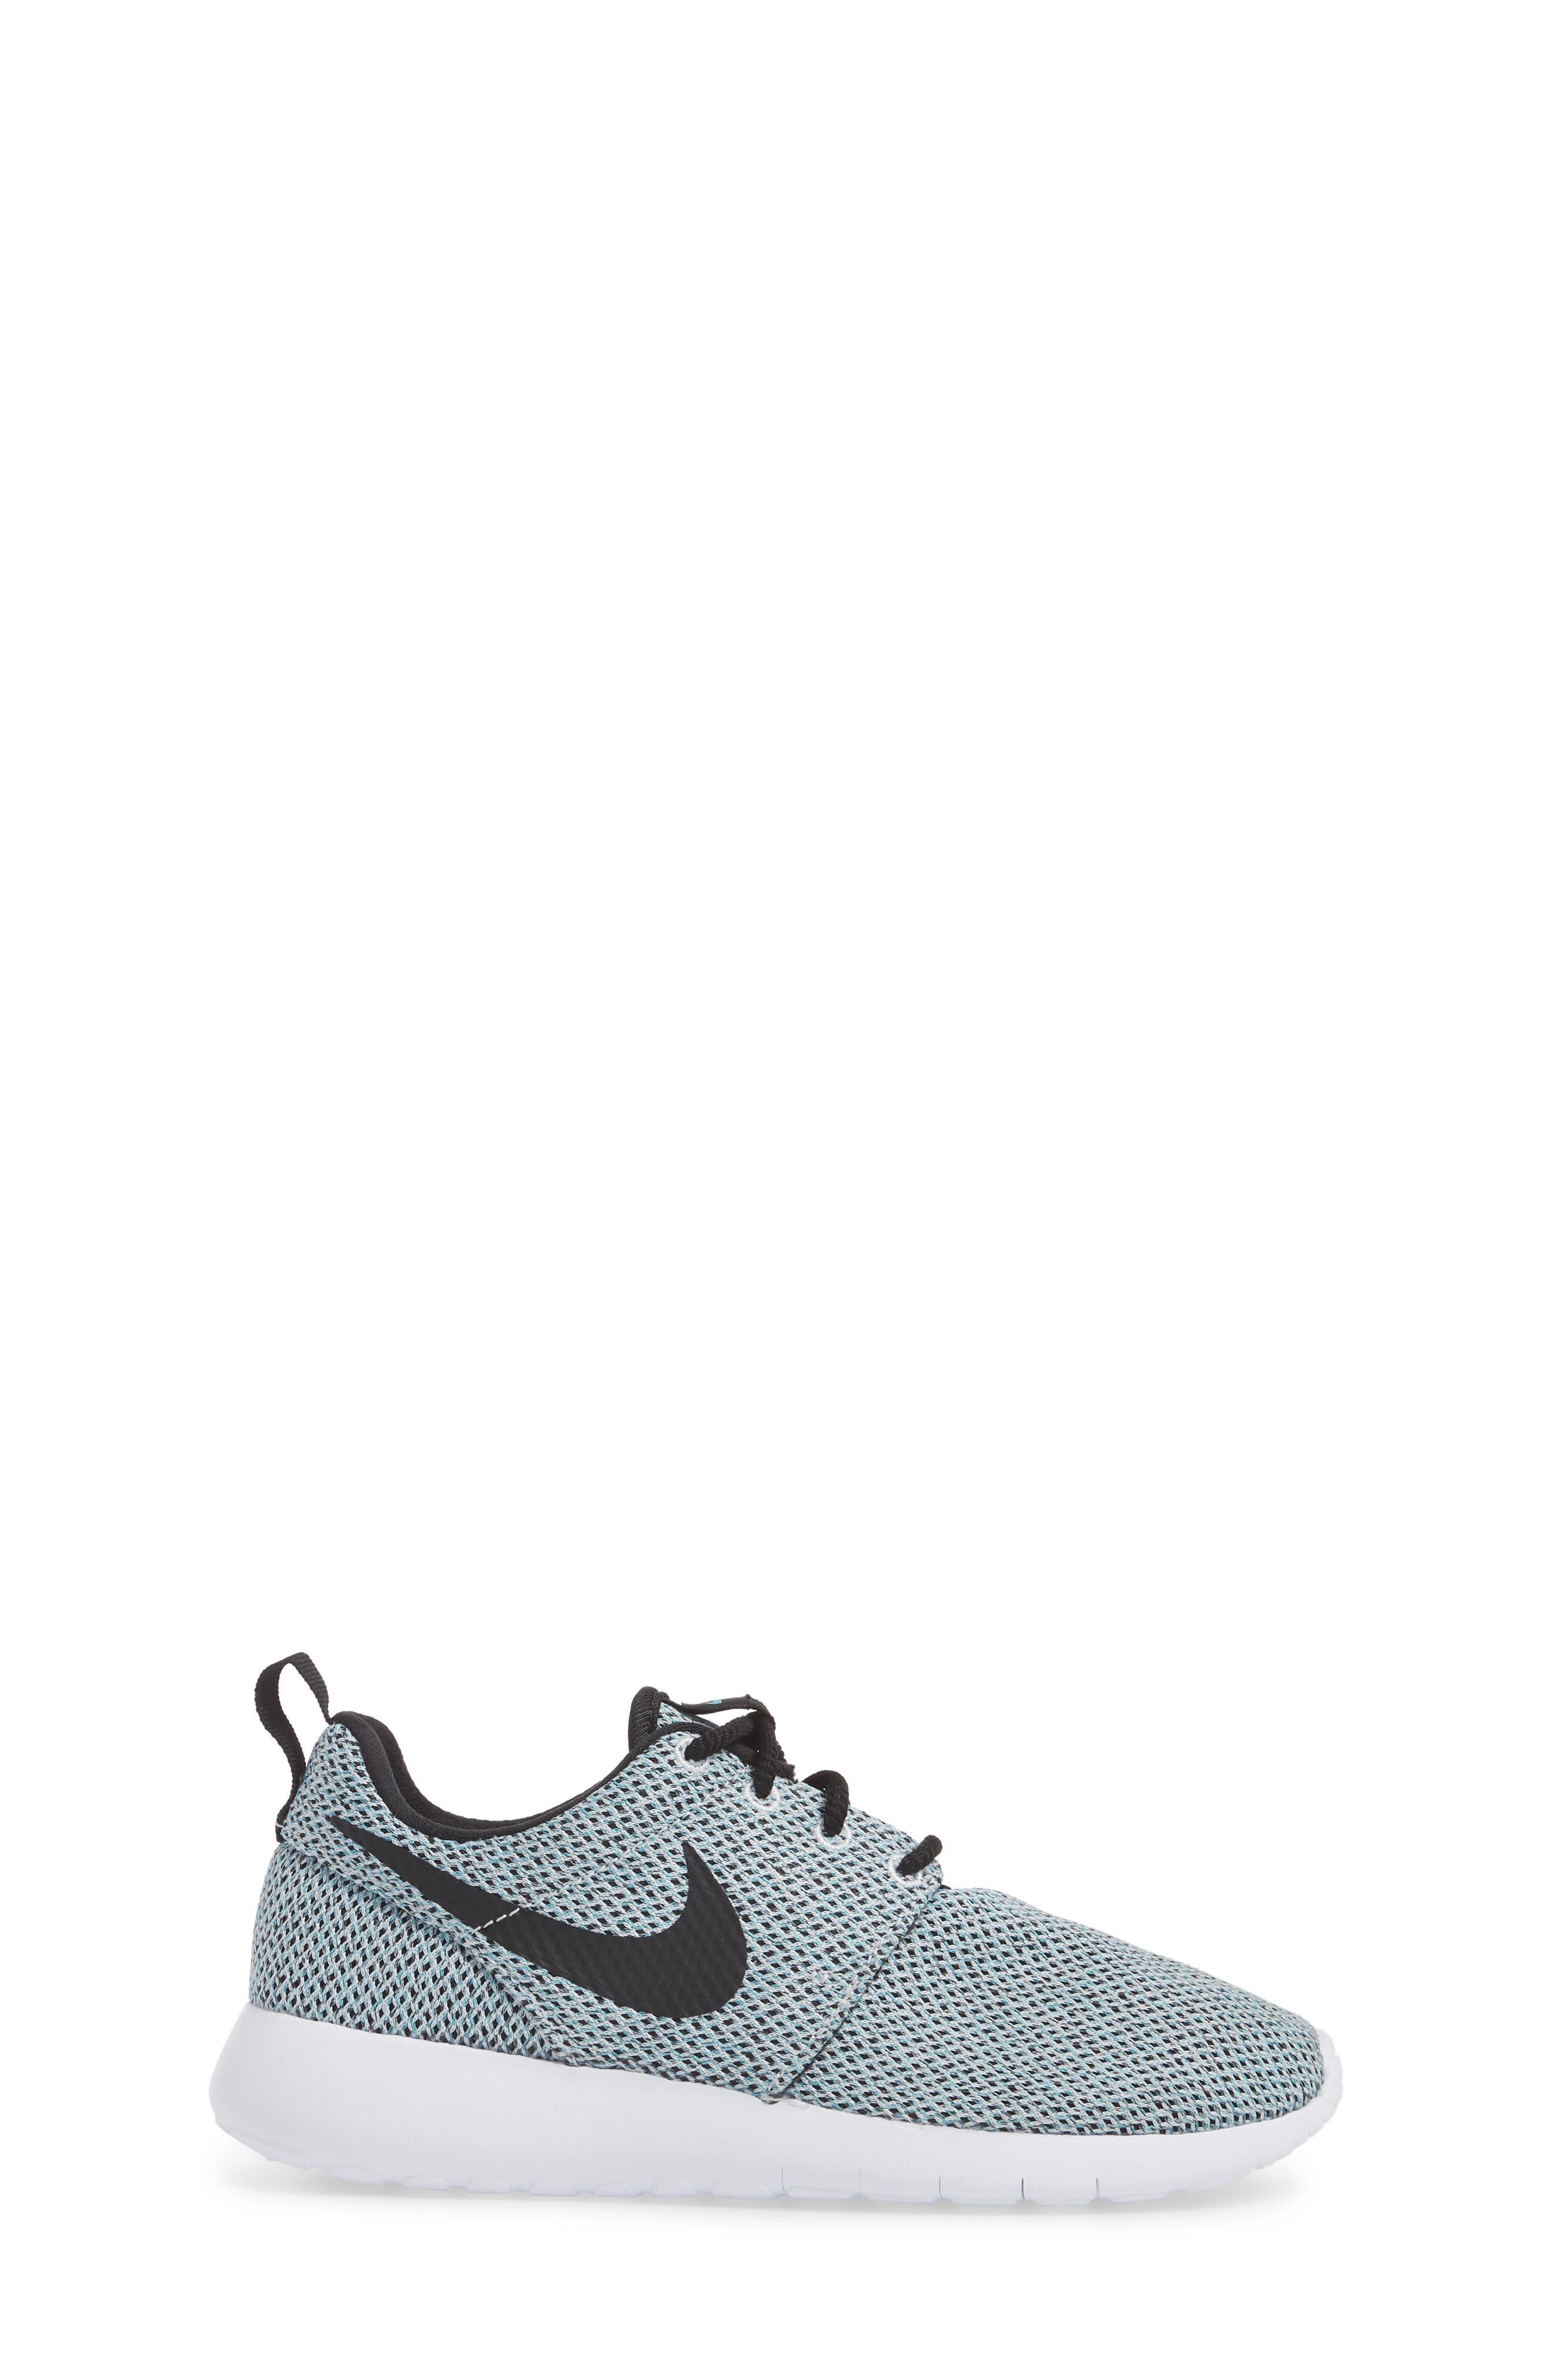 'Roshe Run' Athletic Shoe,                             Alternate thumbnail 113, color,